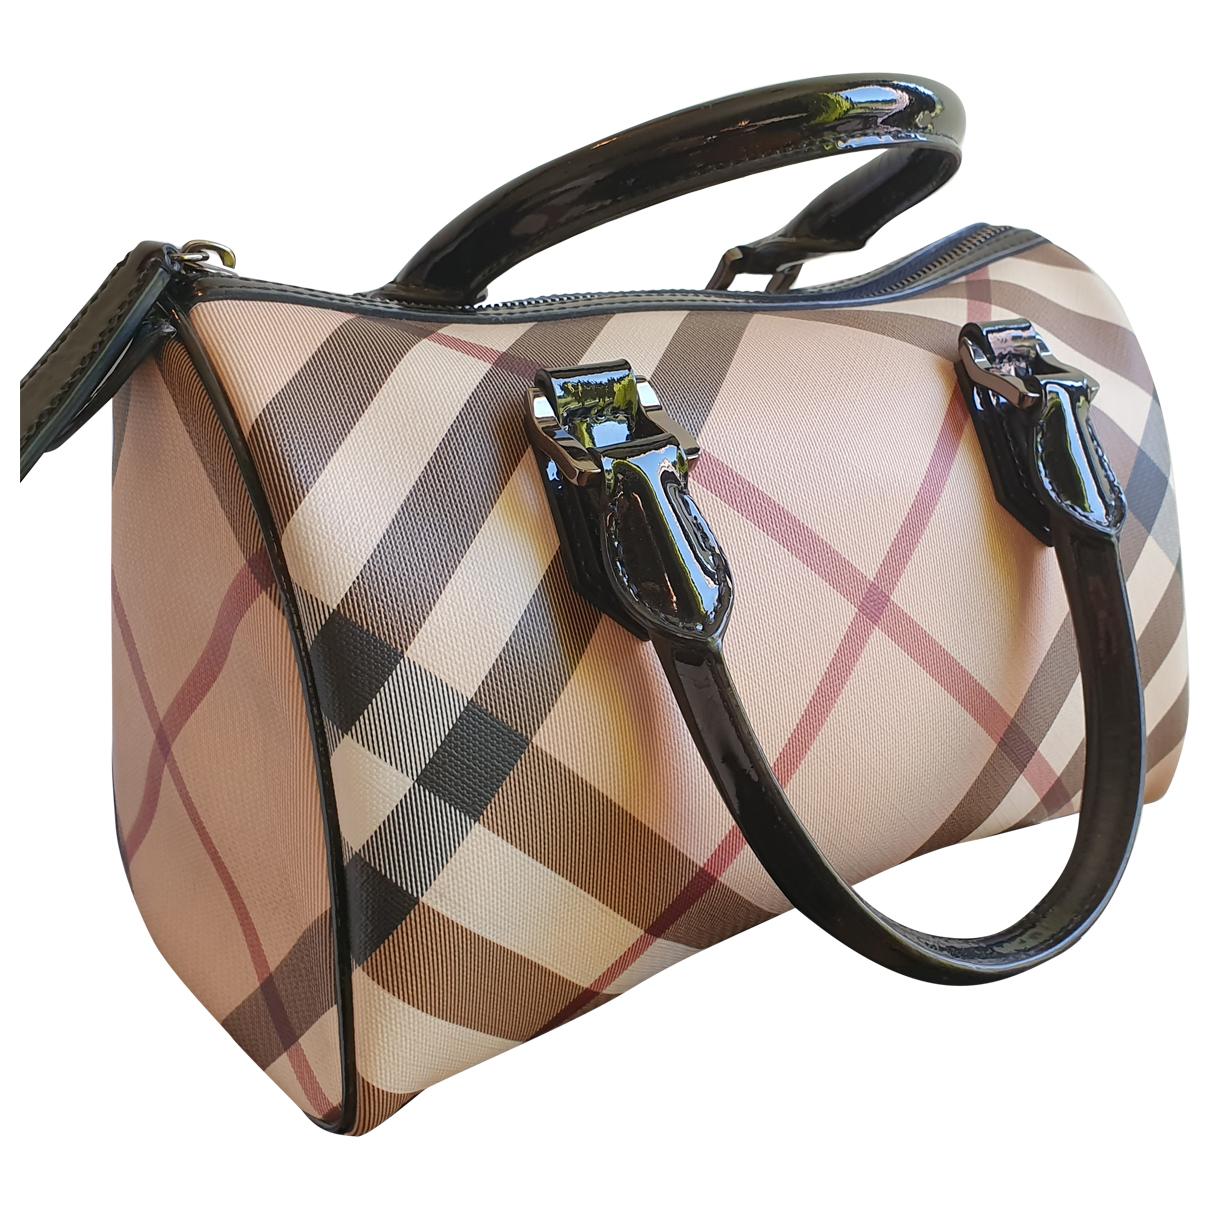 Burberry N Beige Cloth handbag for Women N